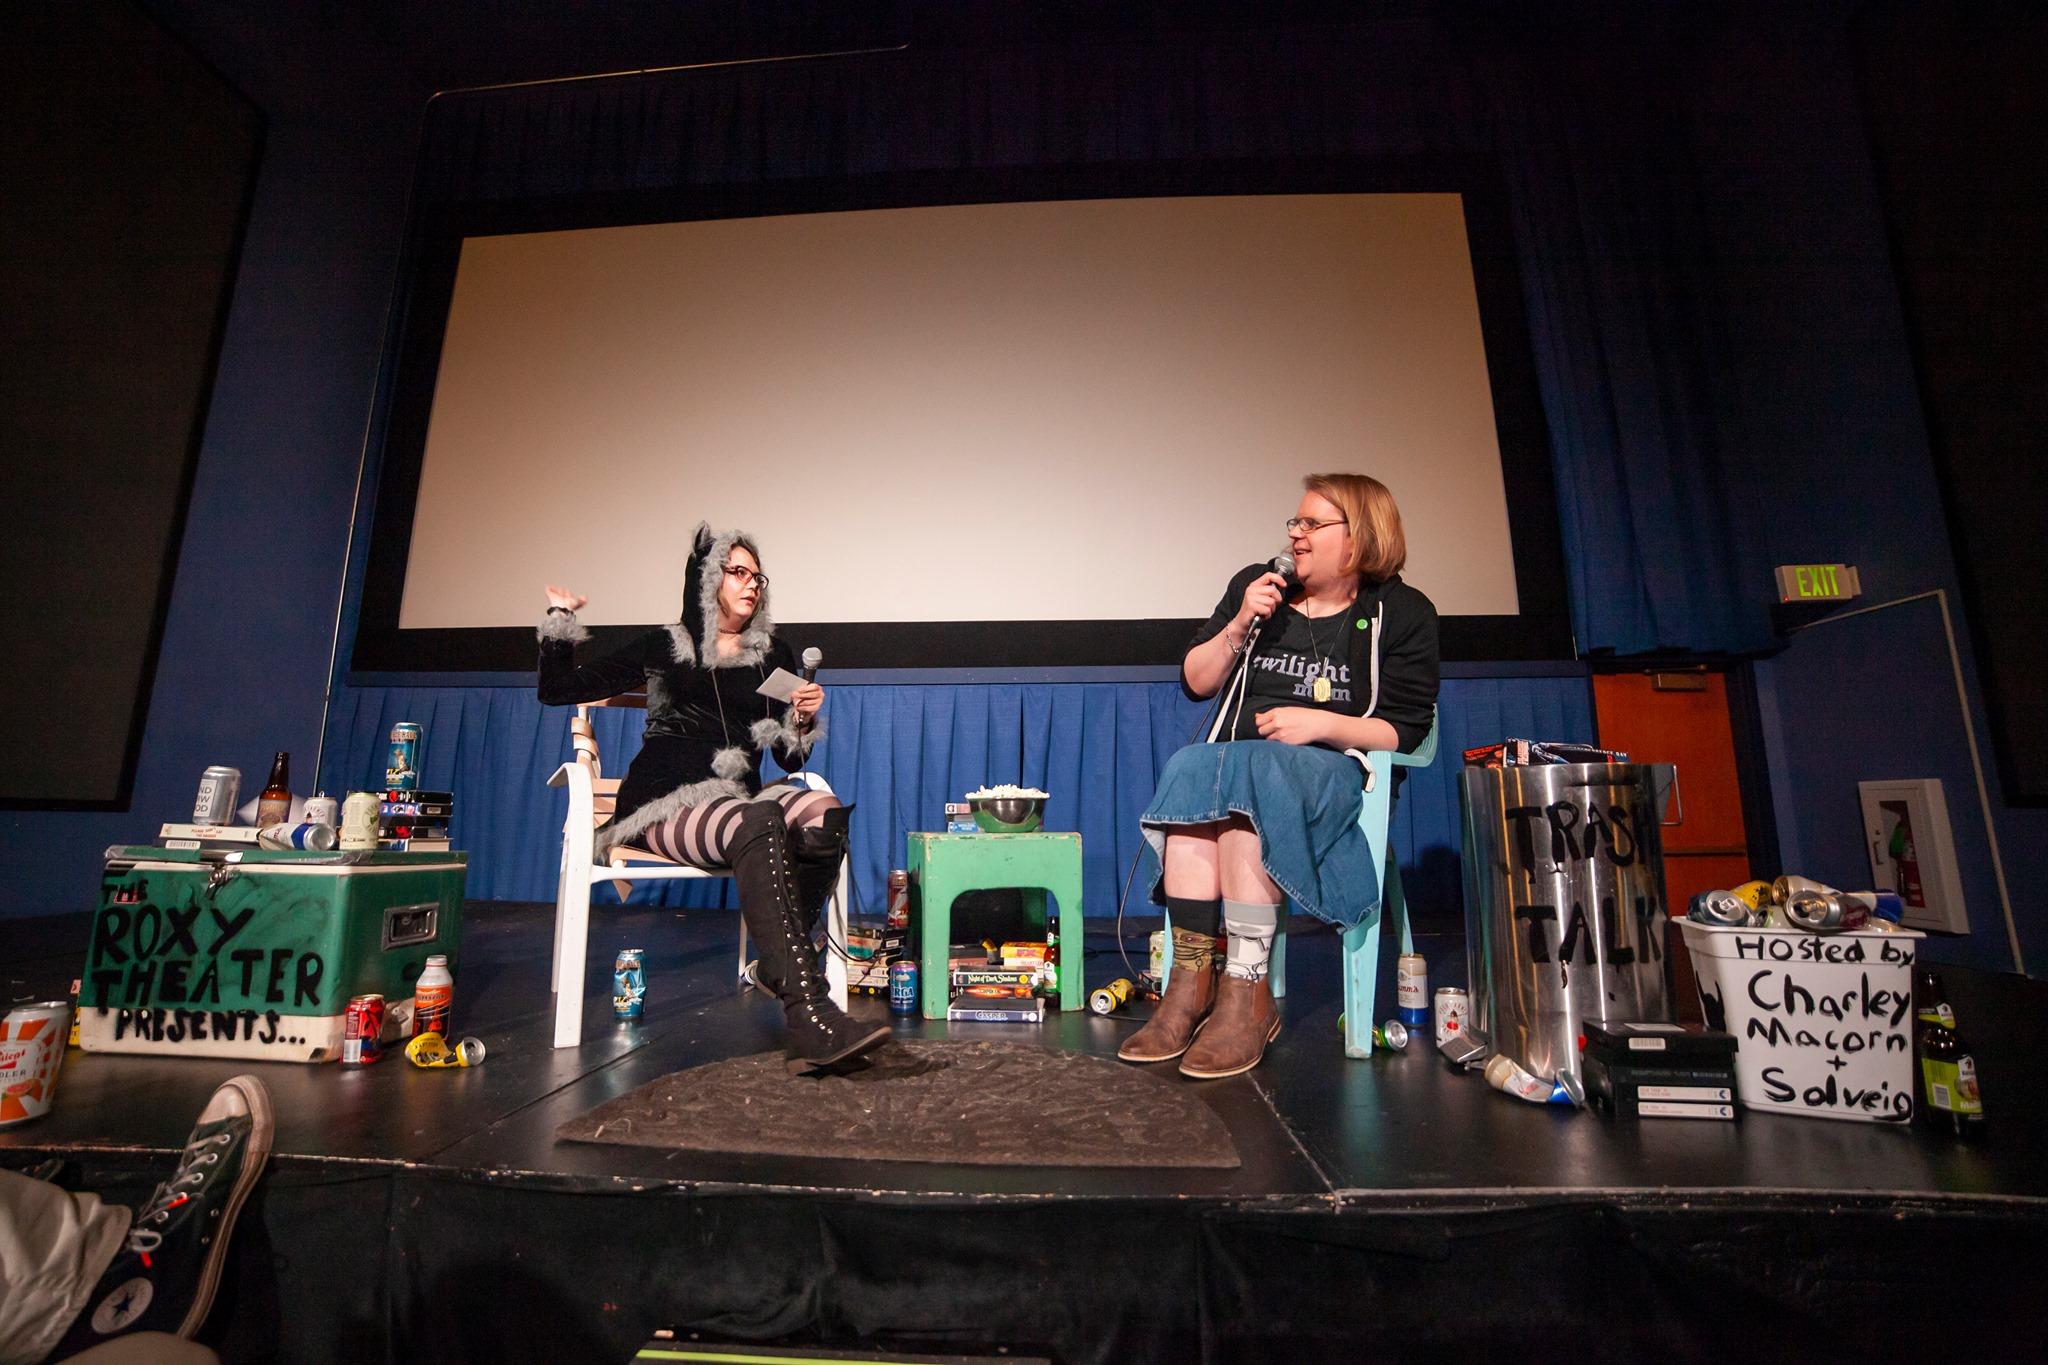 Trash Talk 2 photo Austin Valley.jpg